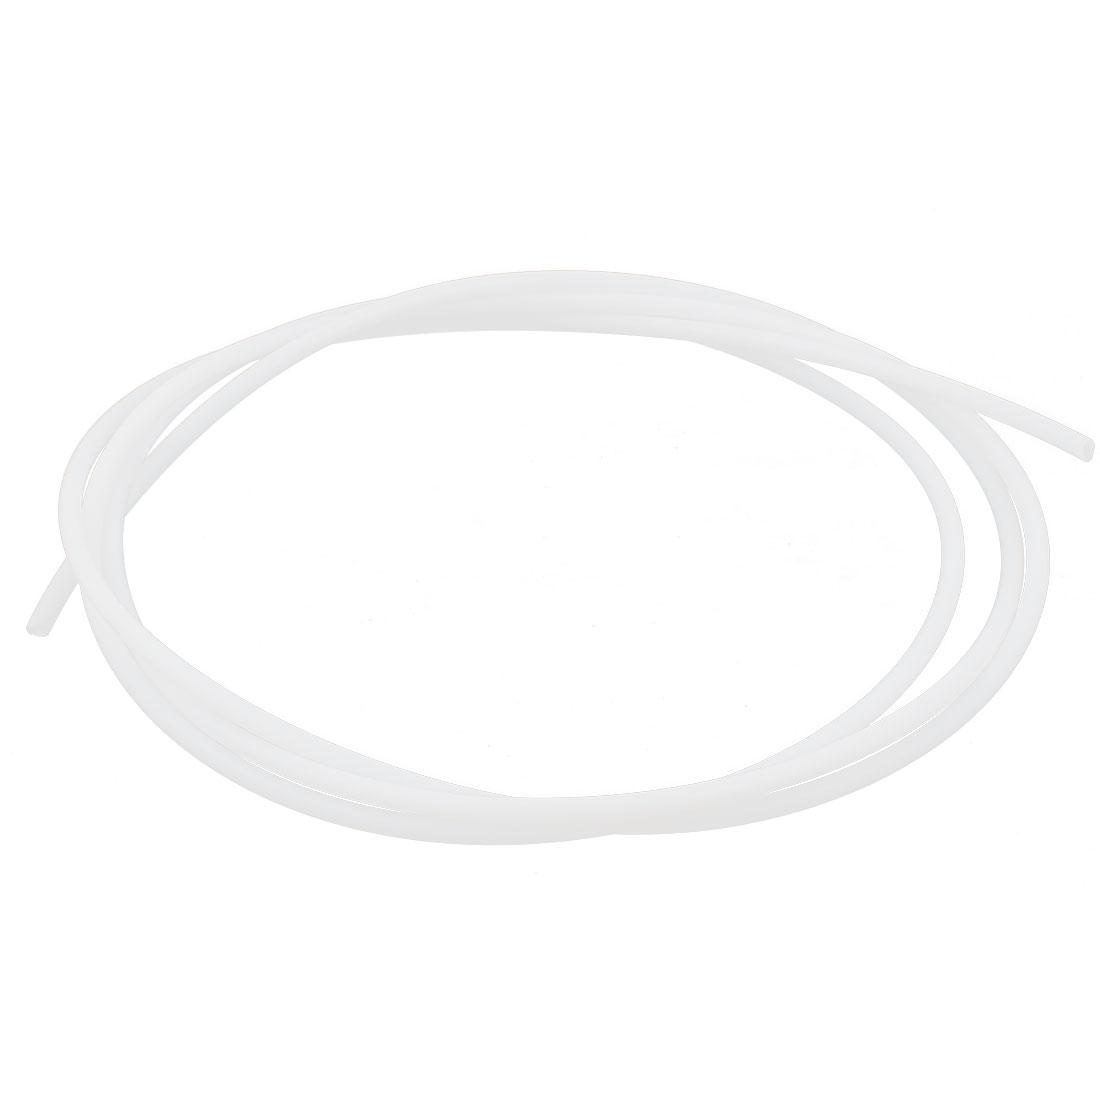 3mm ID 5mm OD PTFE Tubing Tube Pipe 2M 6.5ft for 3D Printer RepRap